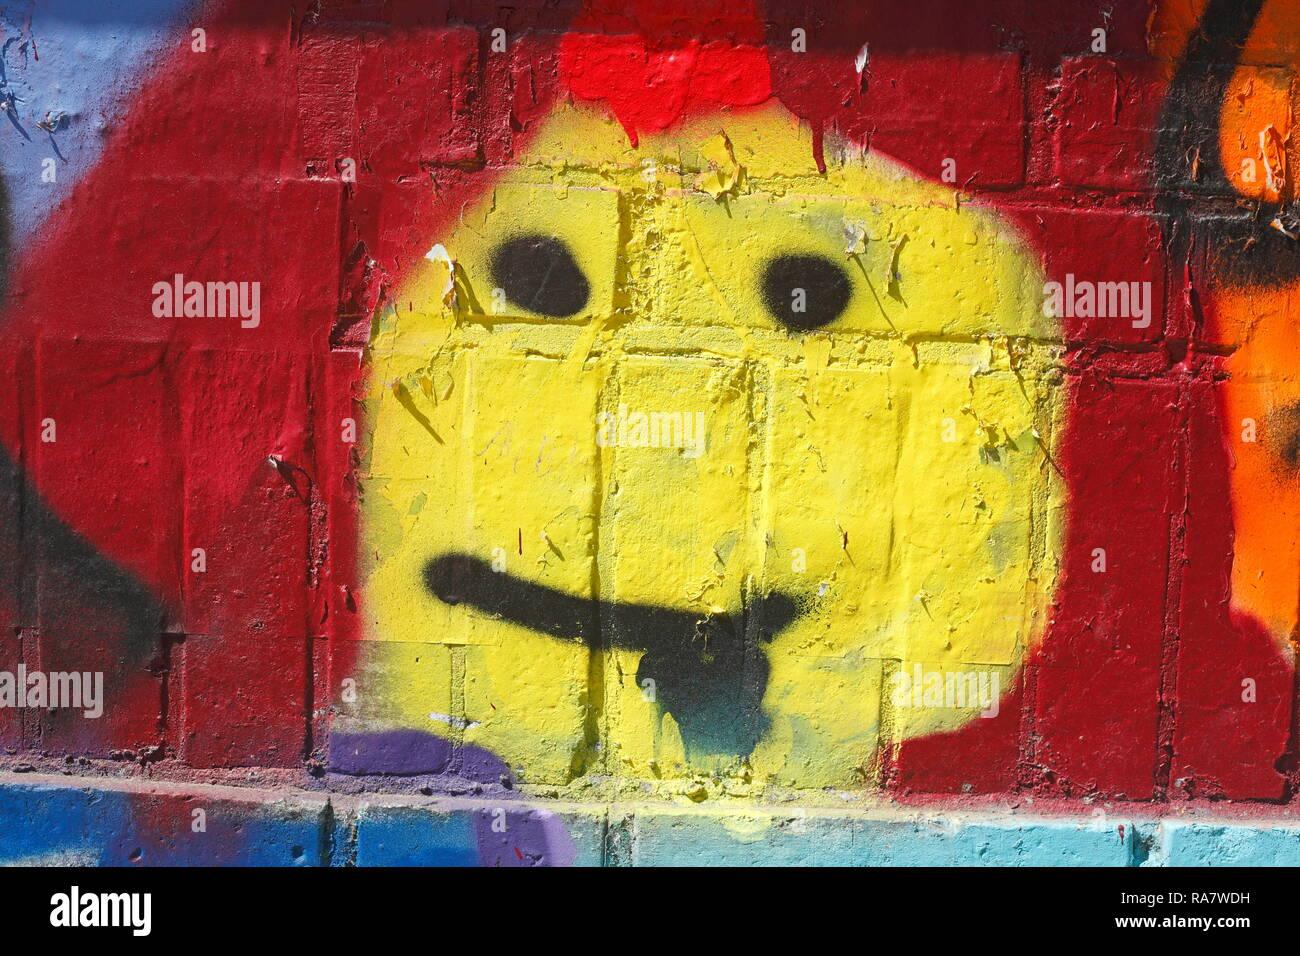 Yellow smiley, Colorful brick wall, Germany, Europe I Gelber smiley, Bunte  Ziegelsteinmauer, Deutschland, Europa I Stock Photo